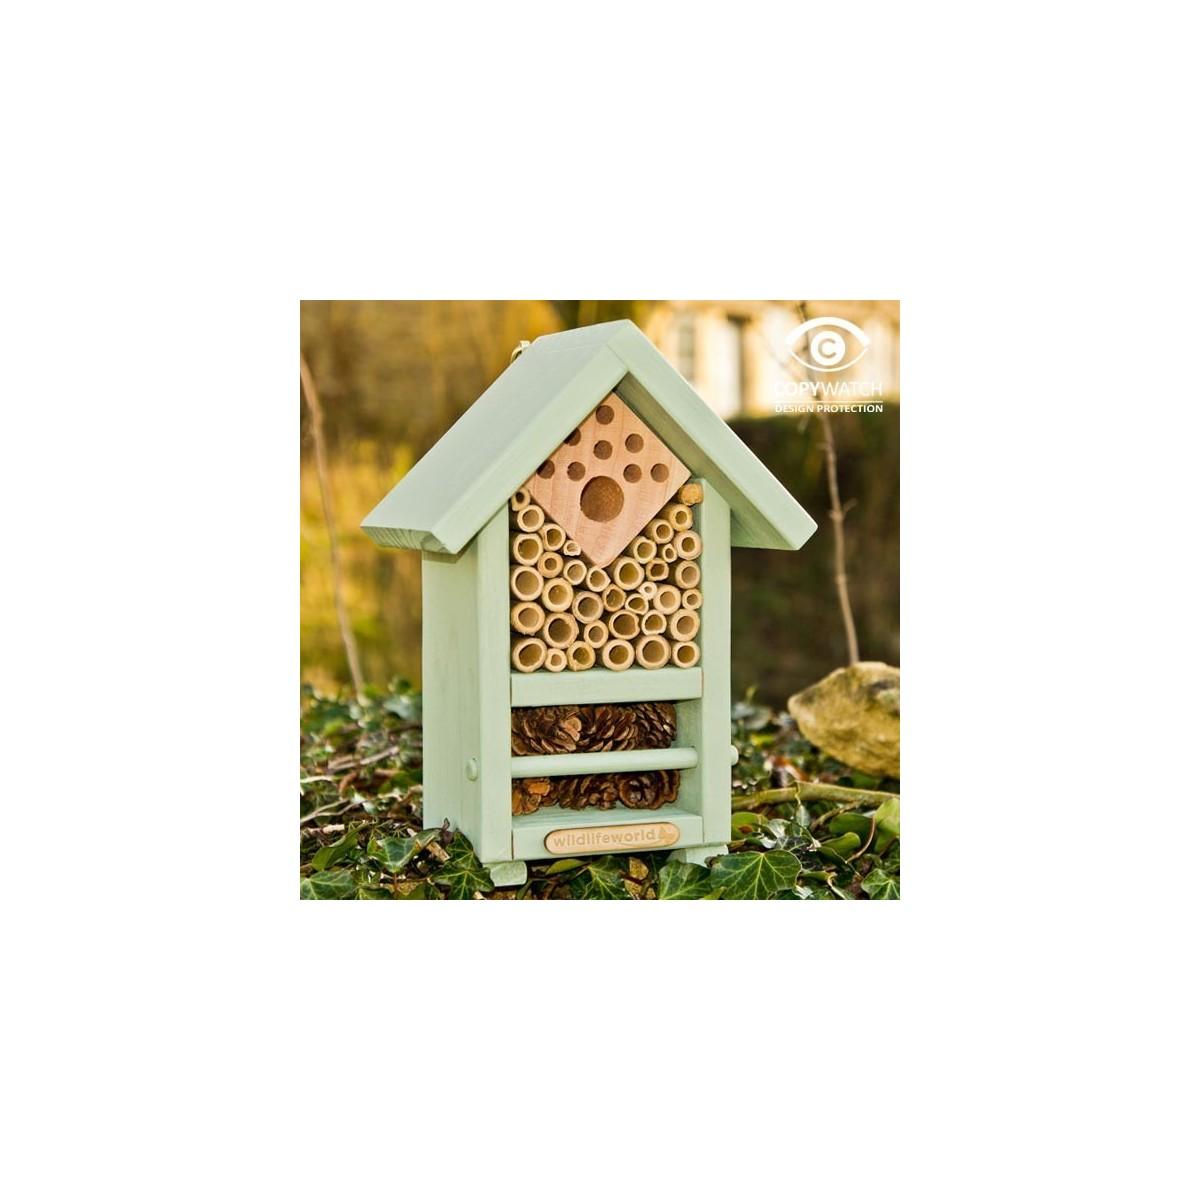 abri abeilles insectes botanique editions. Black Bedroom Furniture Sets. Home Design Ideas